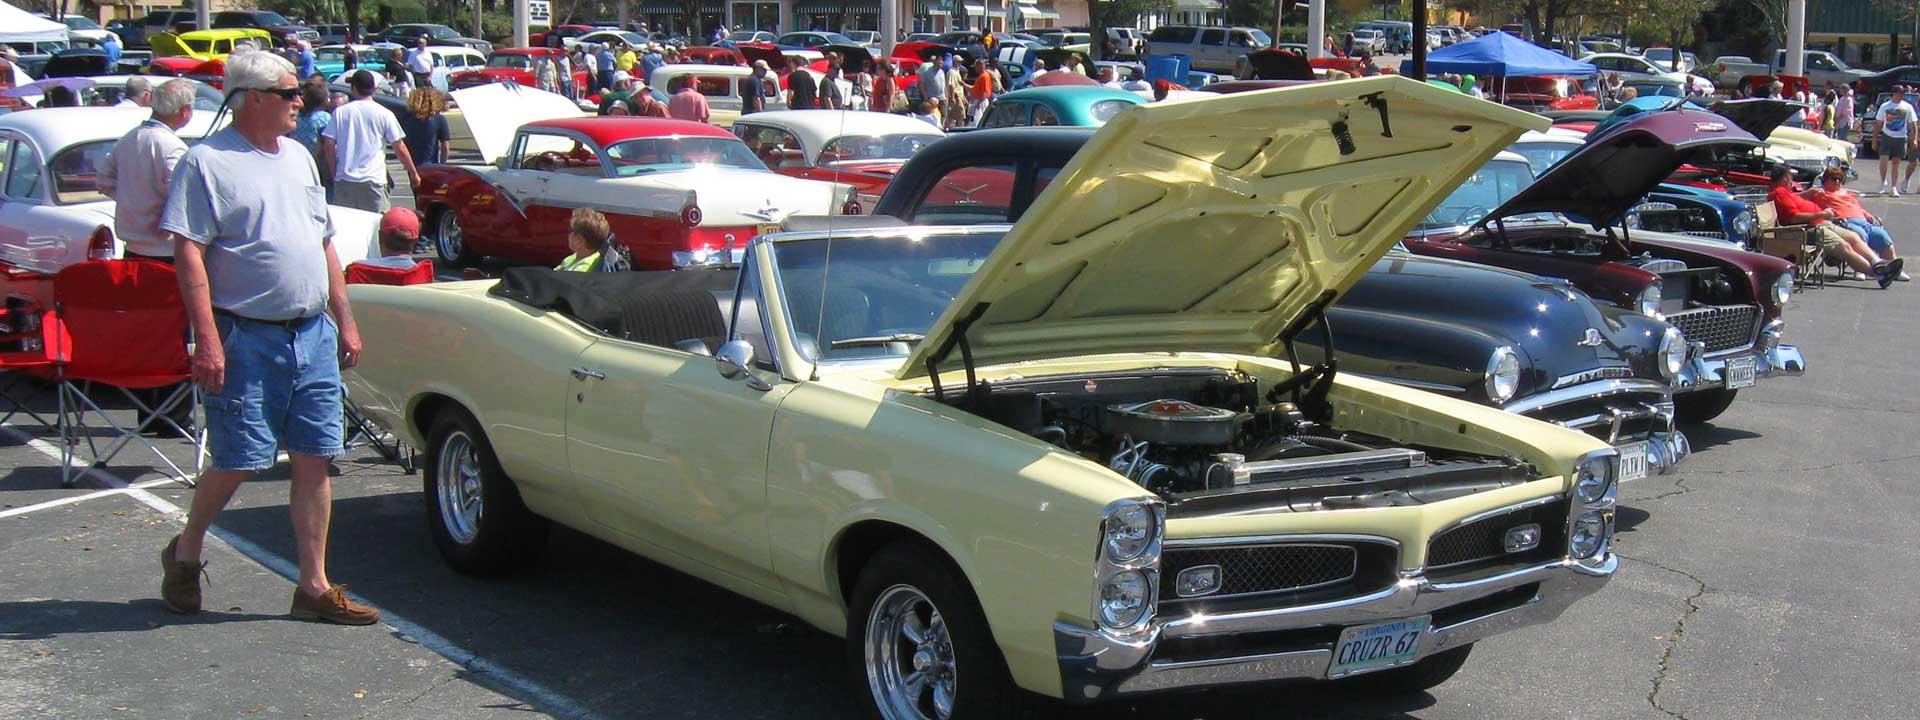 Run To The Sun Car Show 2019 Myrtle Beach Car Show 2019